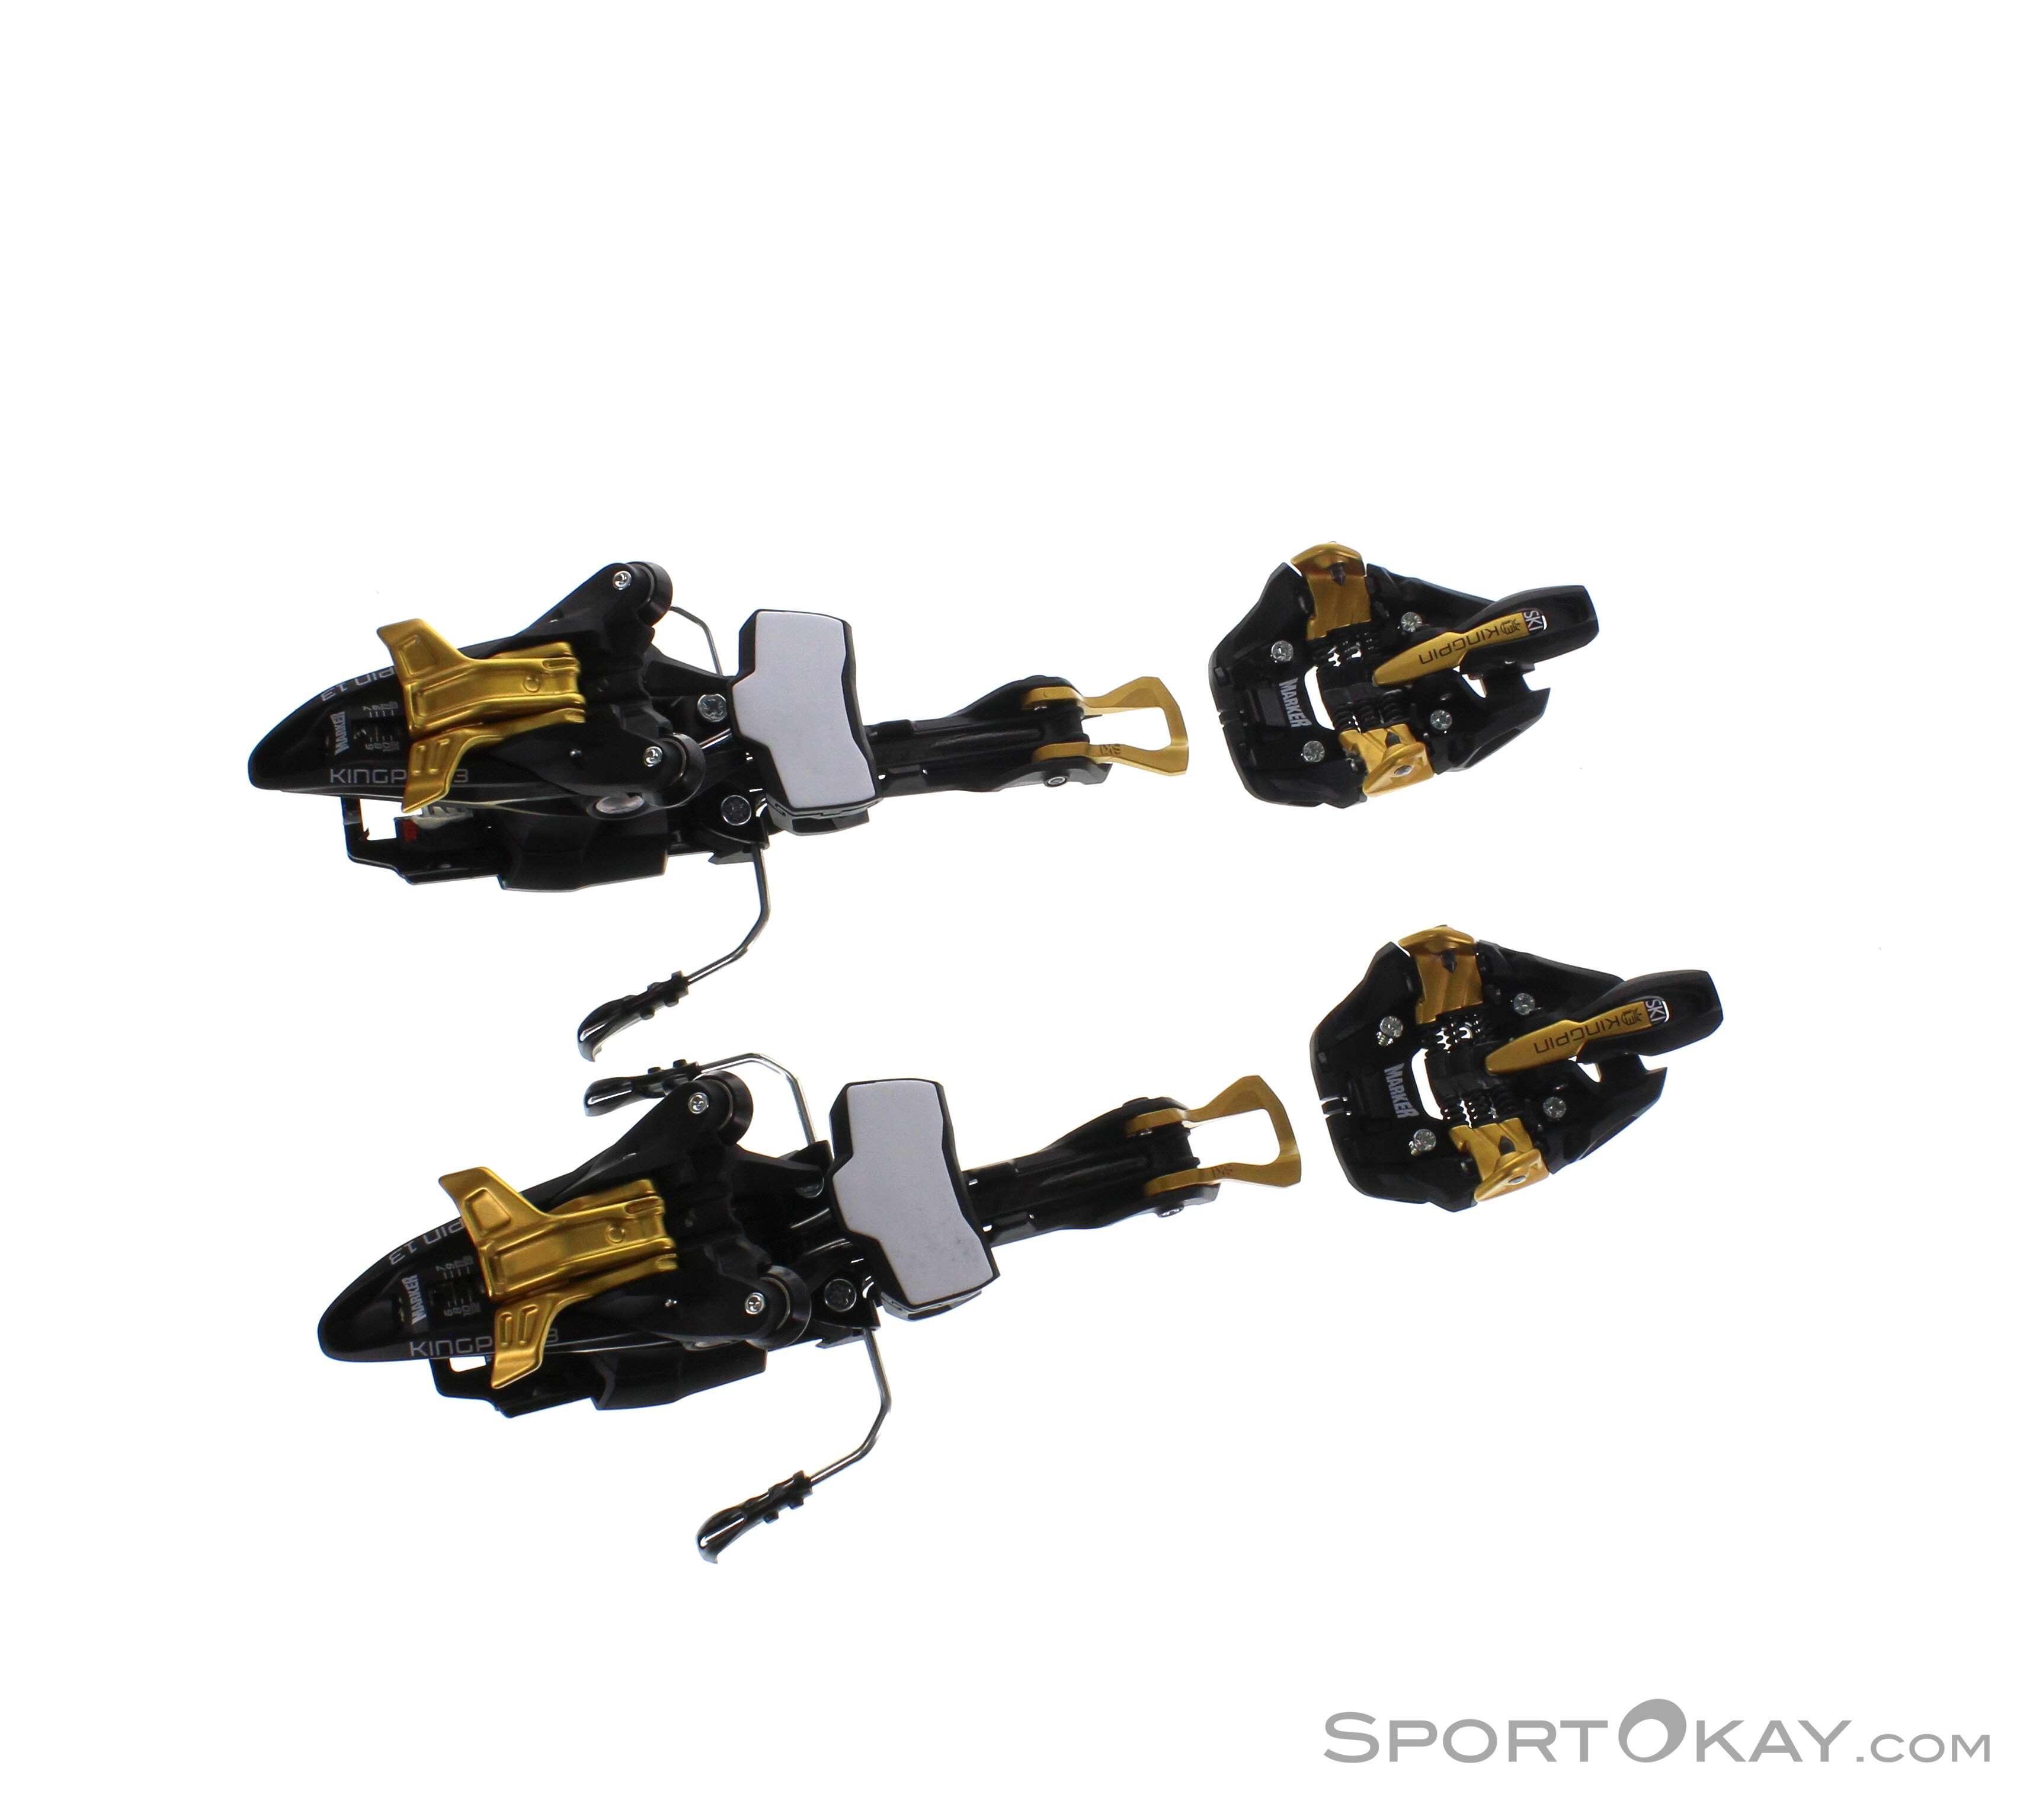 Marker Kingpin 13 100-125mm Ski Touring Bindings - Ski   Freeride ... e61ff63787